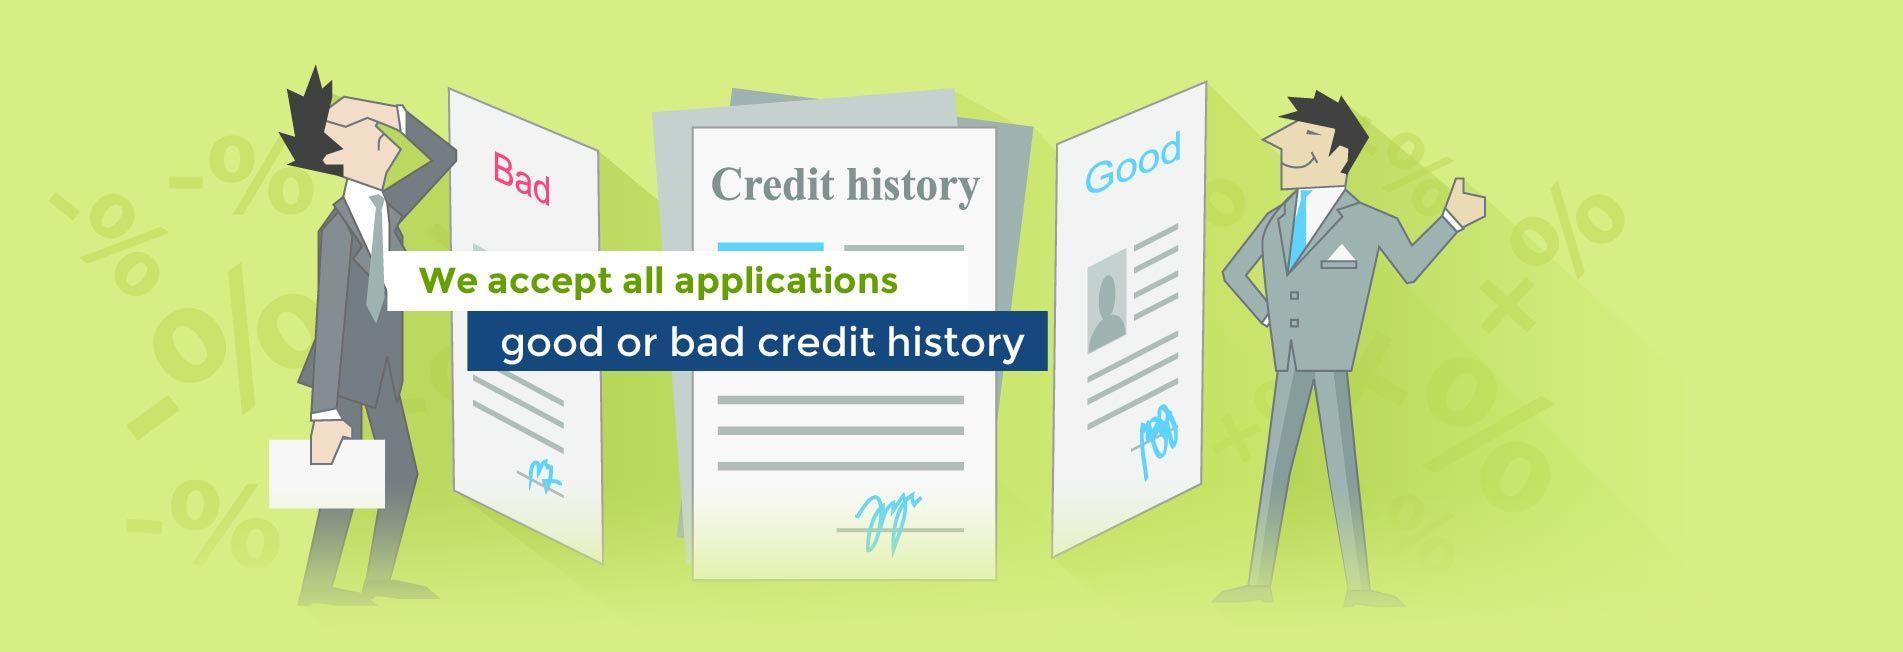 Easy Online Loans Australia, Quick Fast Loans | Good to Go Loans